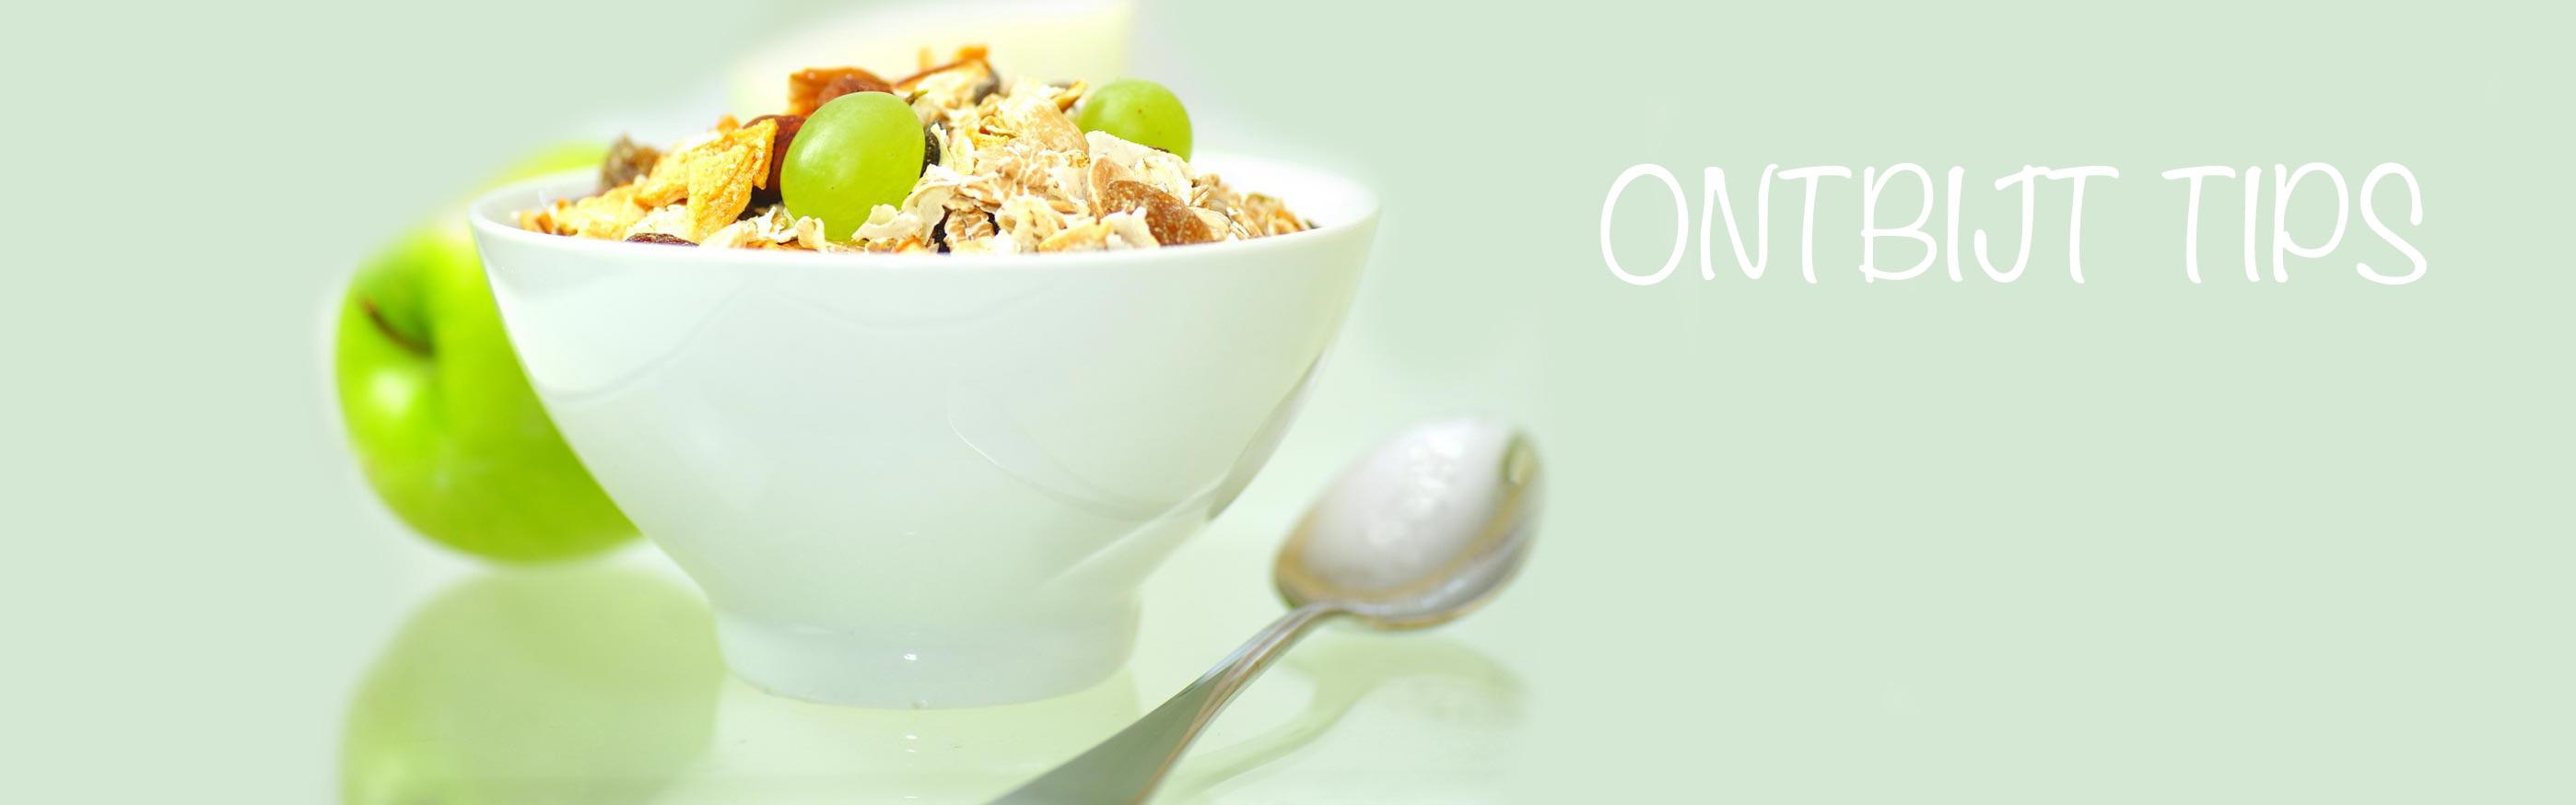 afvallen ontbijt tips